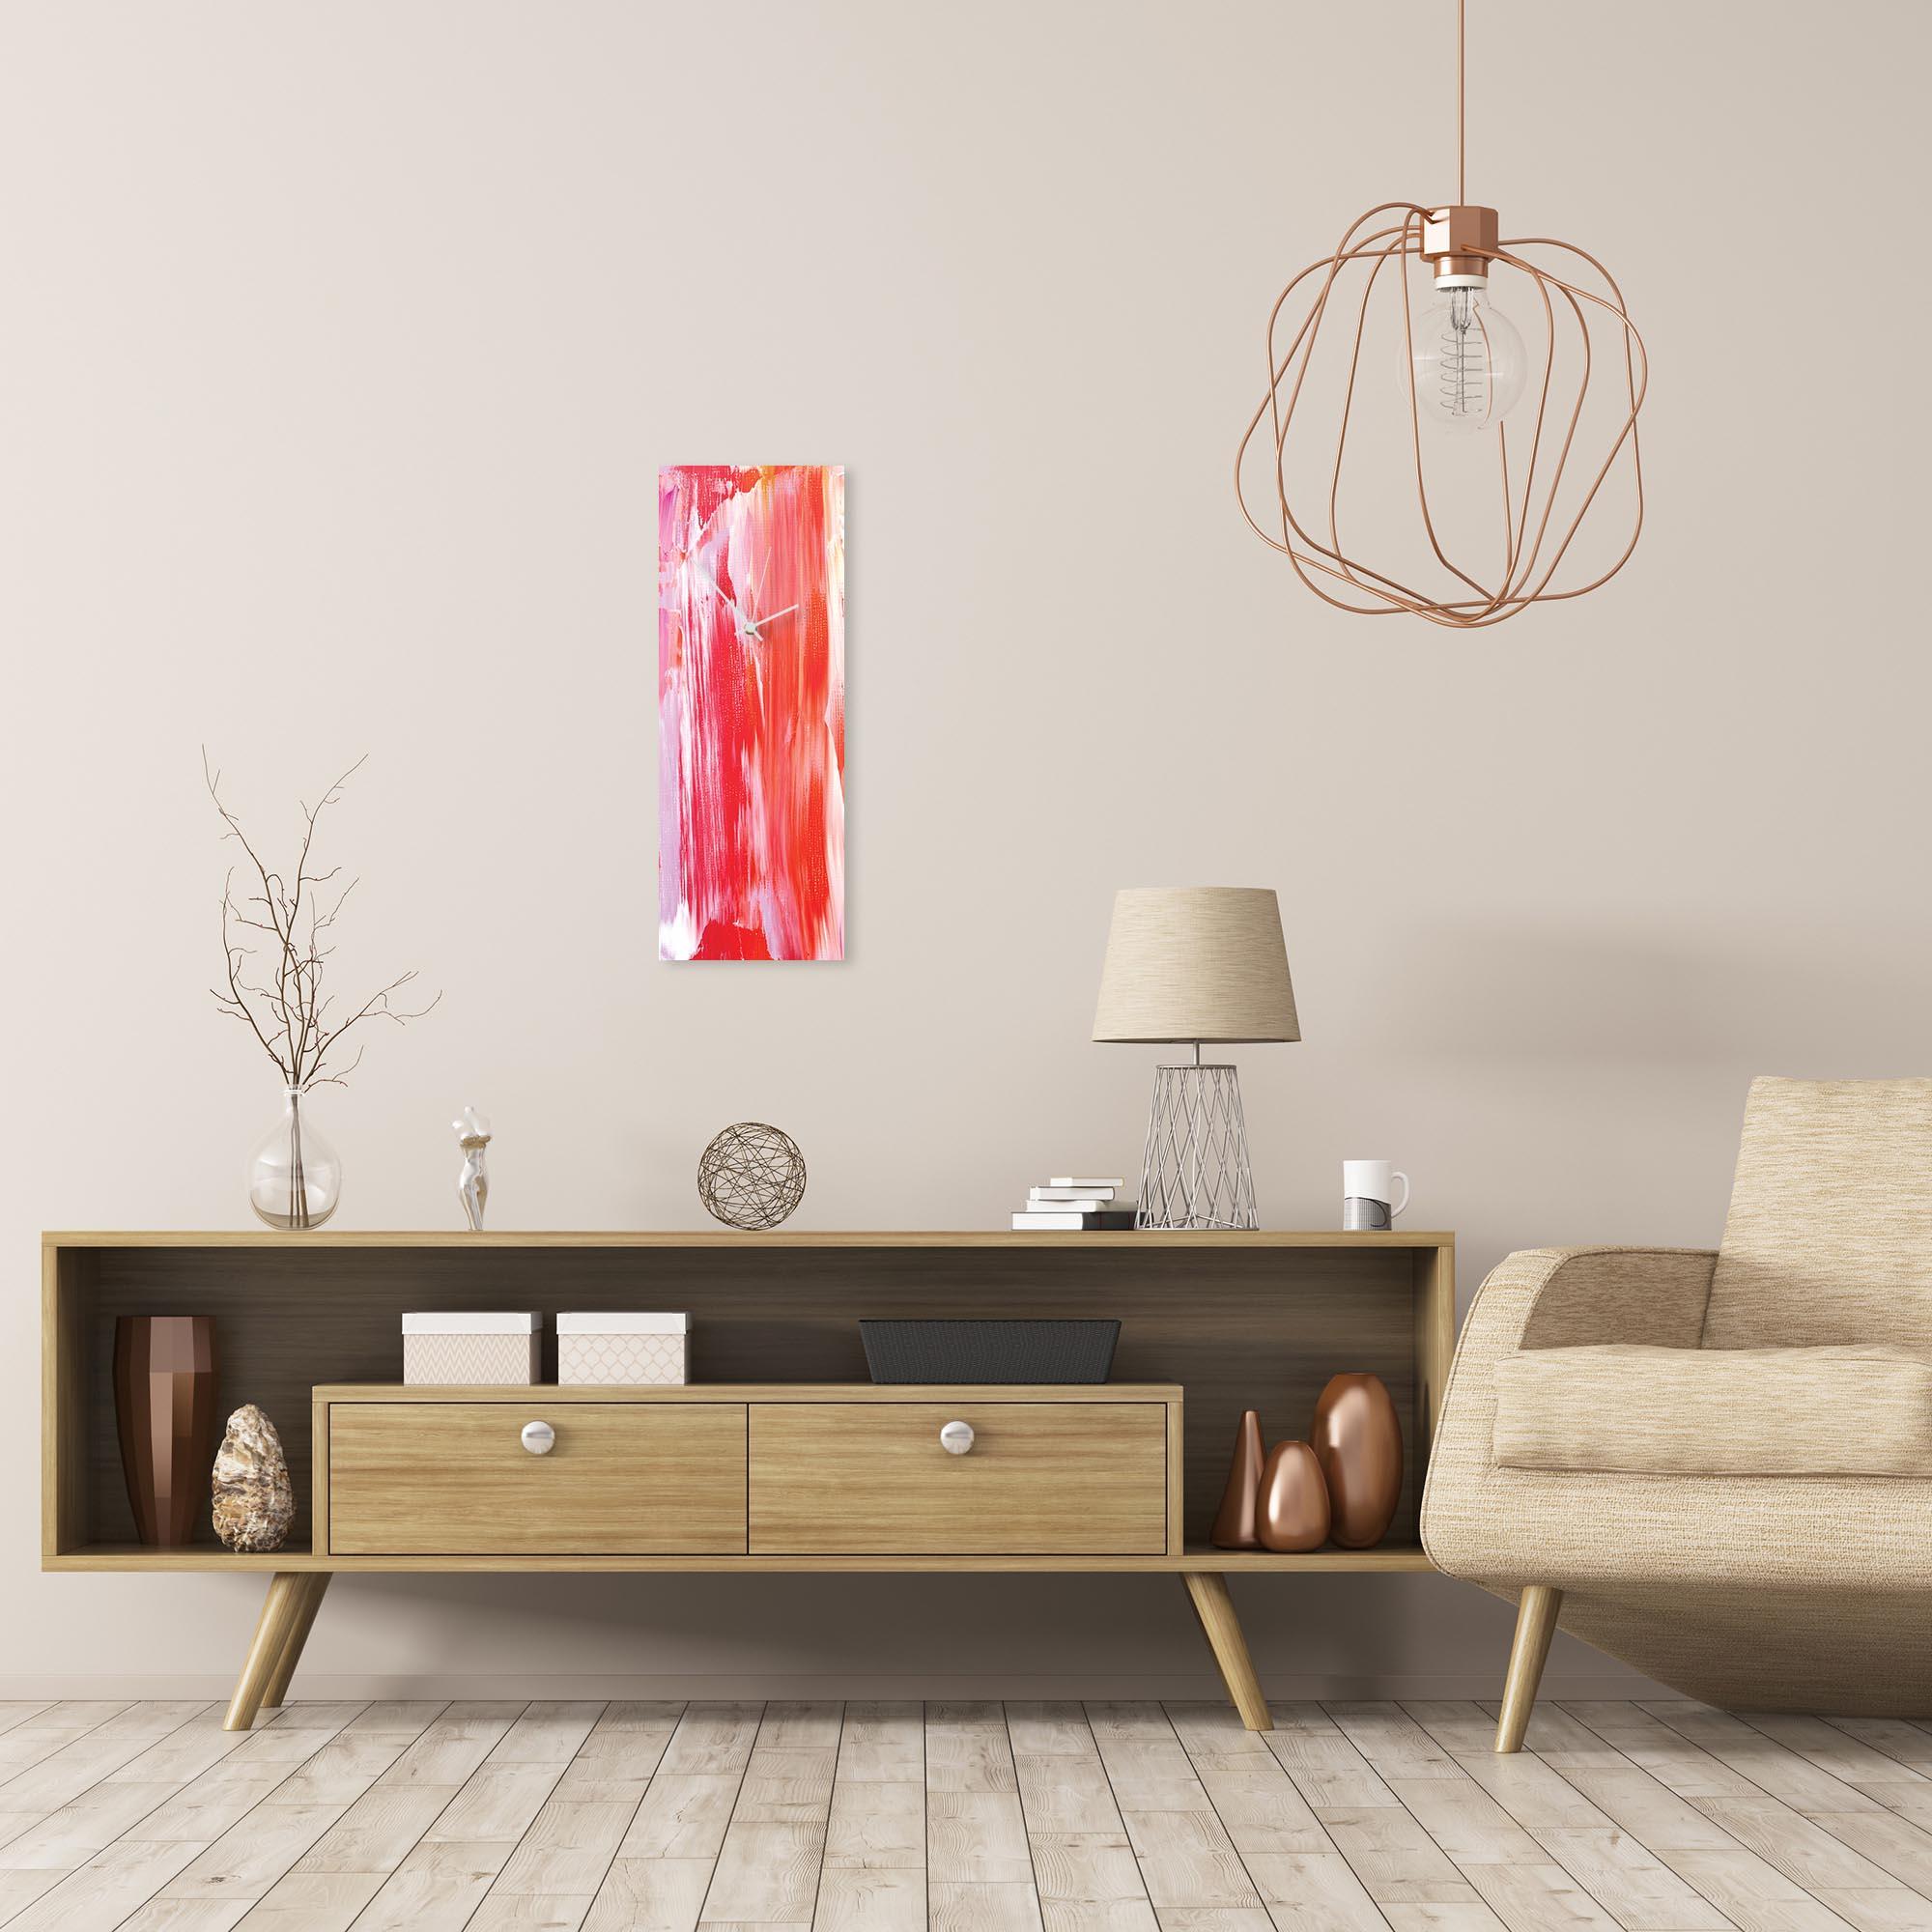 Urban Warmth v4 Clock Large by Celeste Reiter Modern Wall Clock on Metal - Alternate View 1